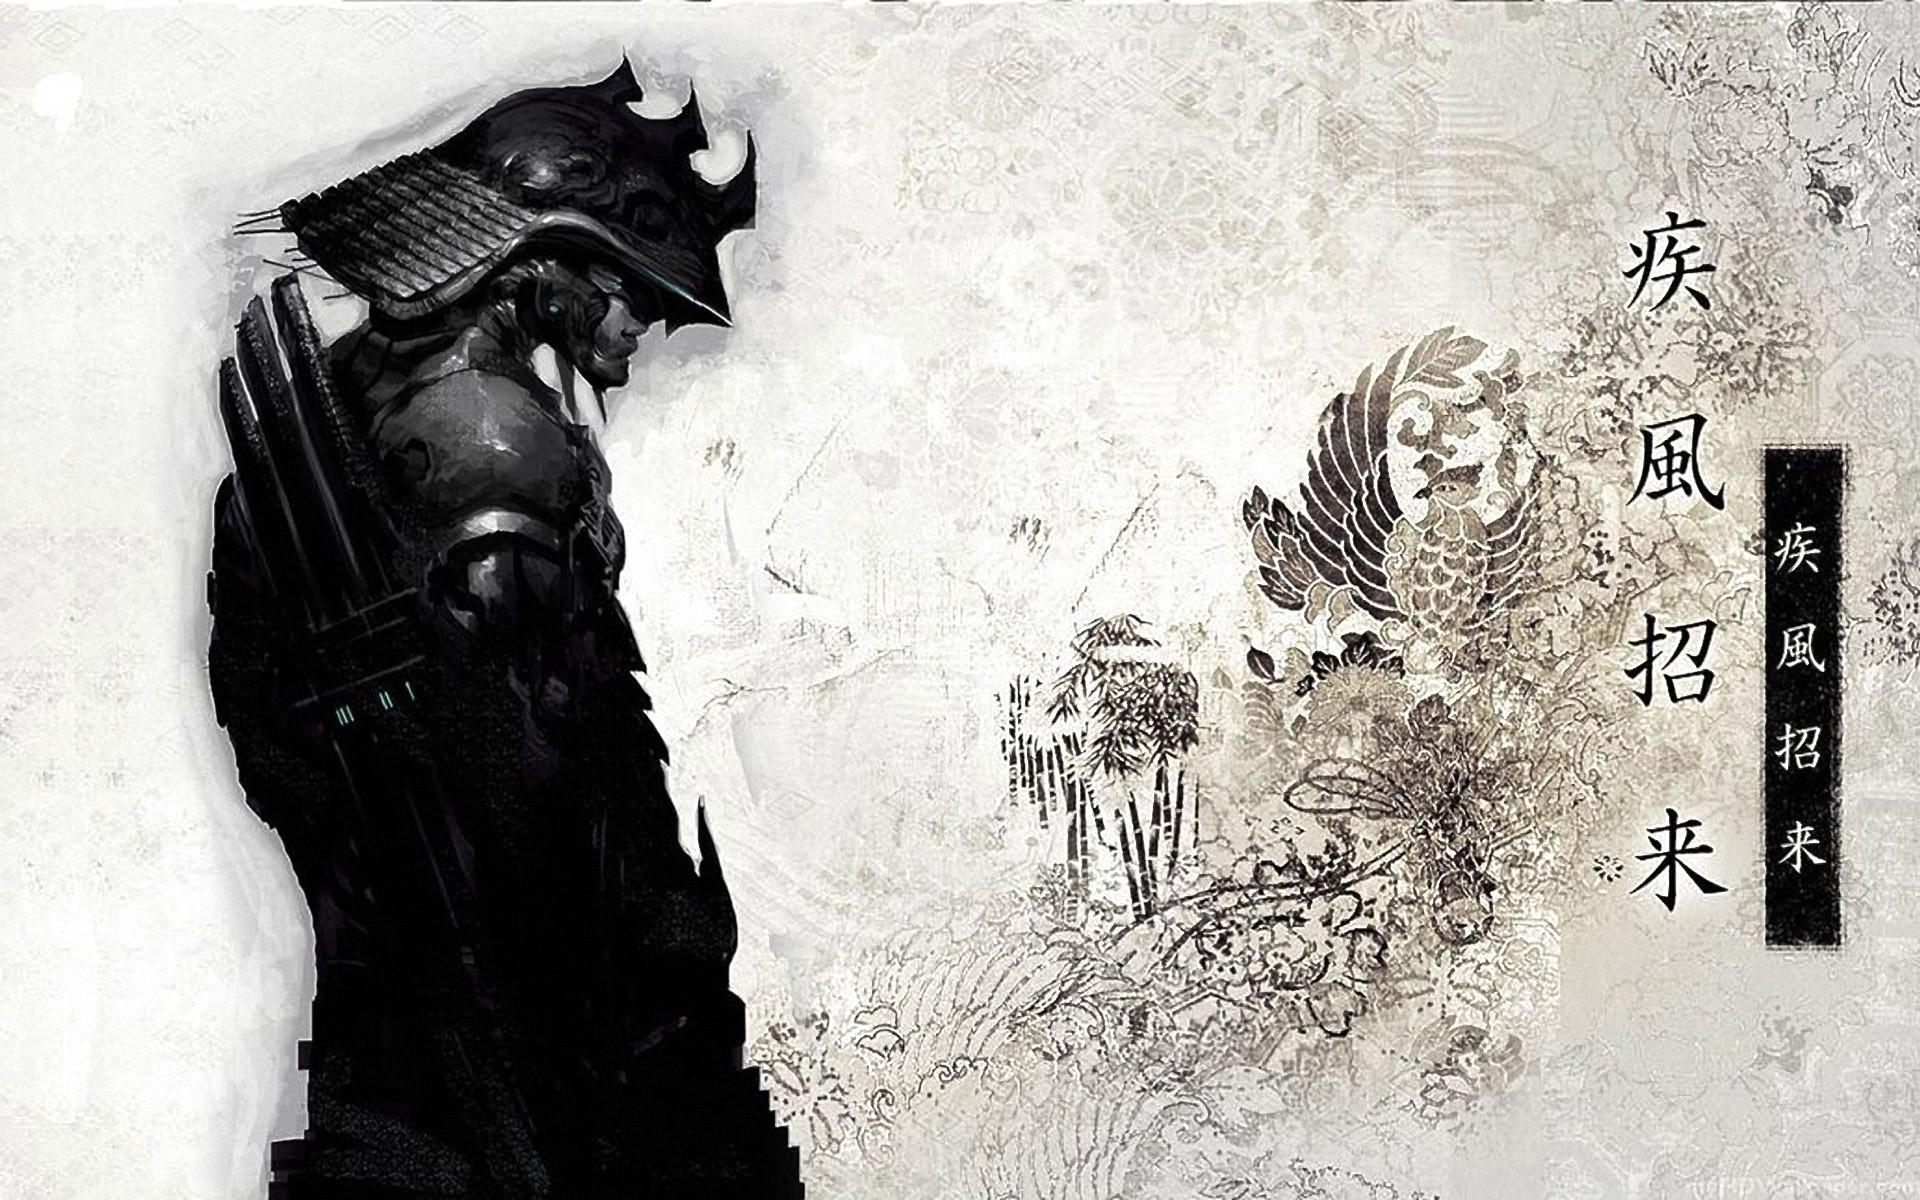 Drawn samurai desktop background Drawn figure Image  Samurai